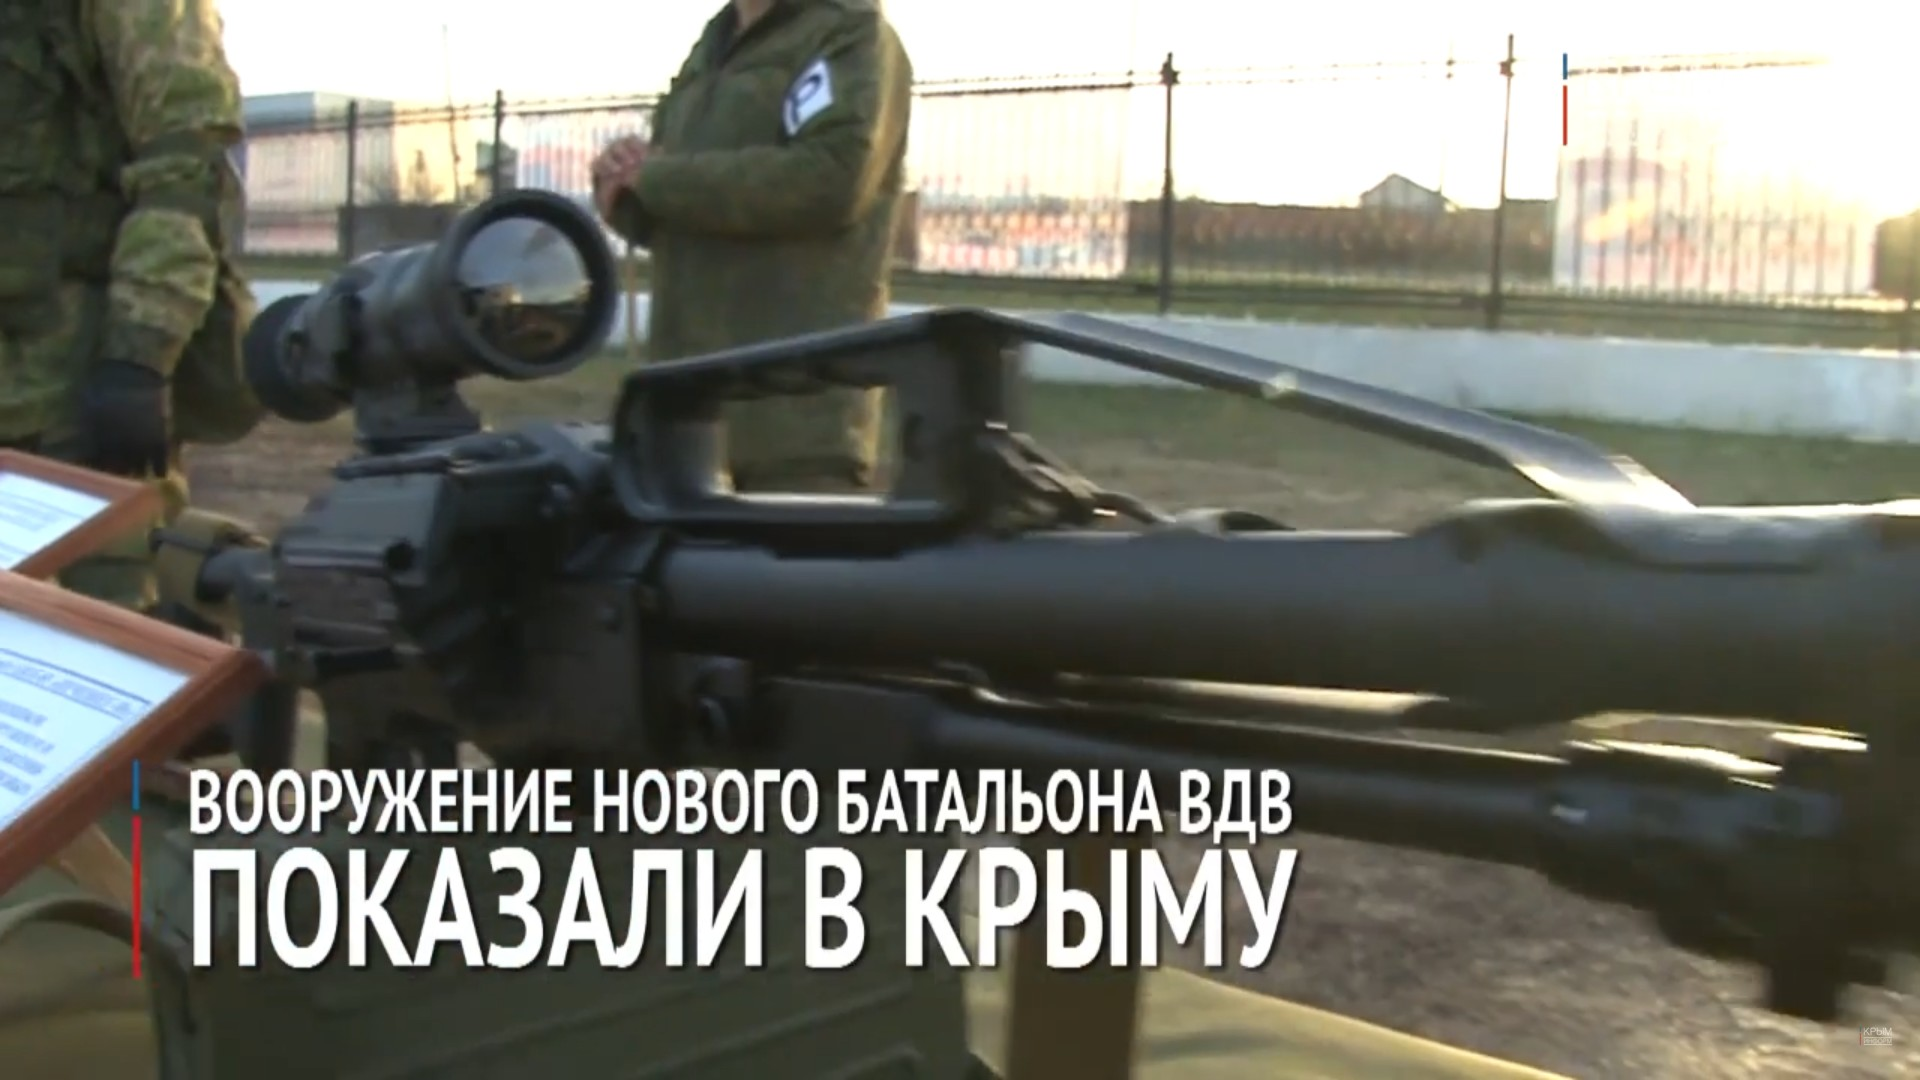 http://sf.uploads.ru/D9KmL.jpg